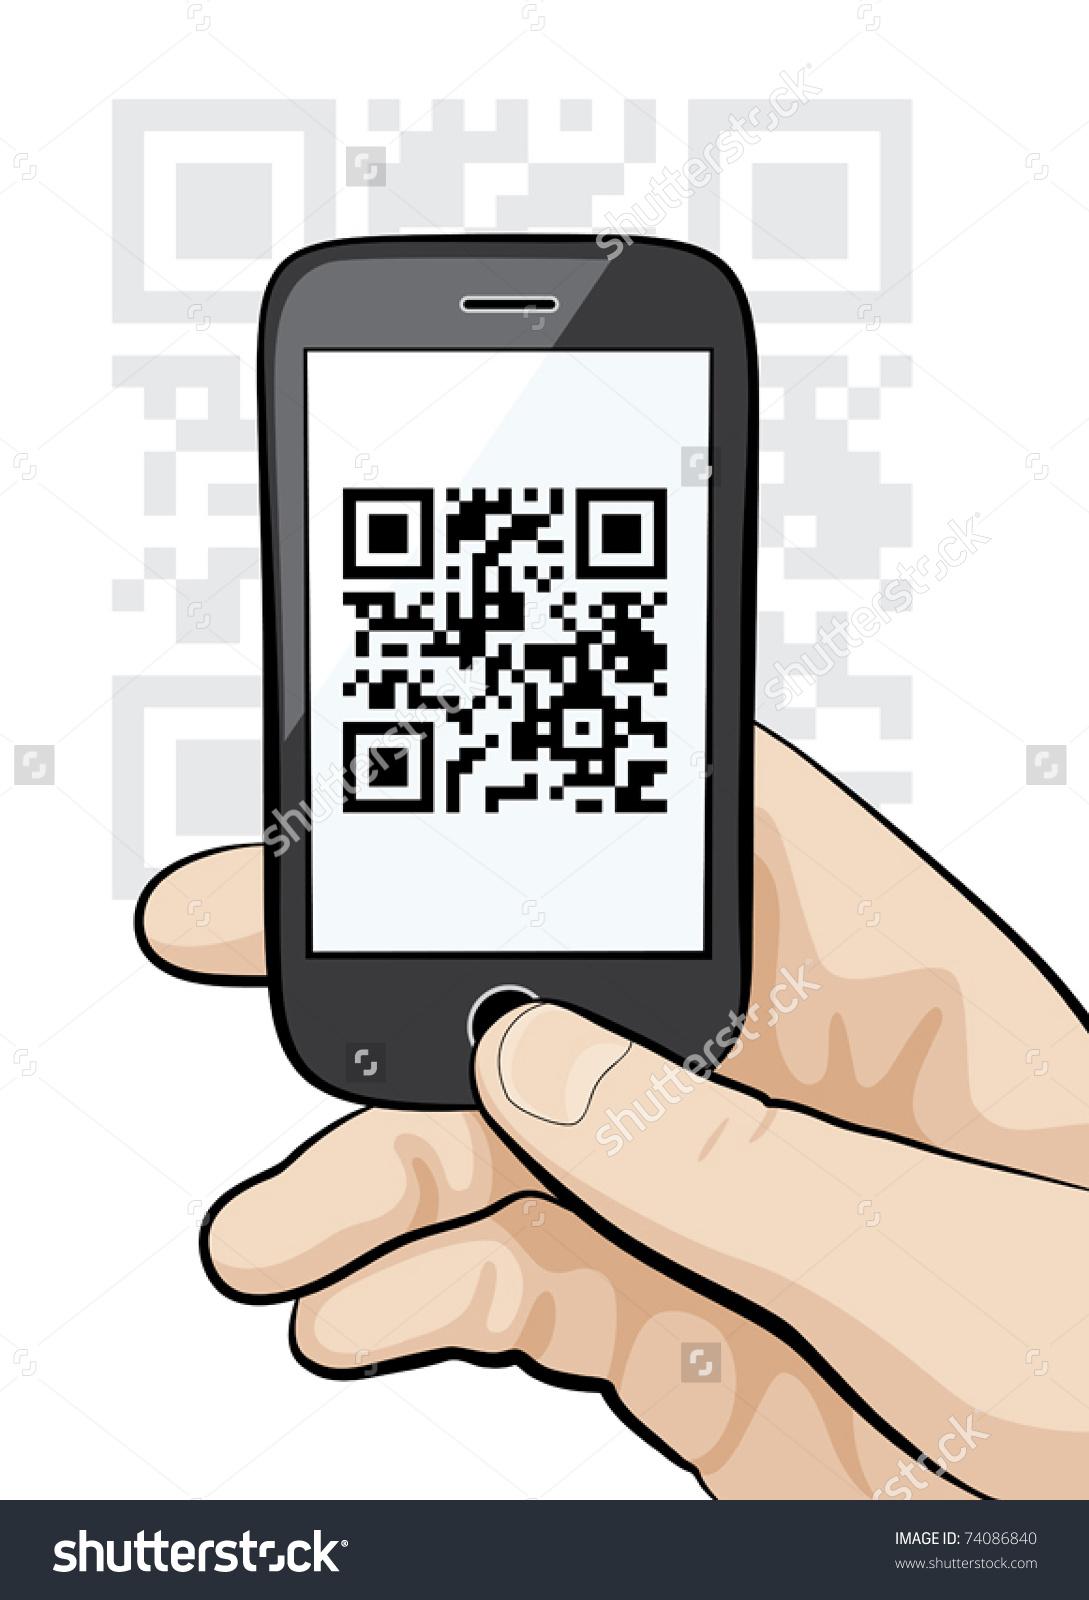 Illustration Mobile Phone Male Hand Scanning Stock Vector 74086840.